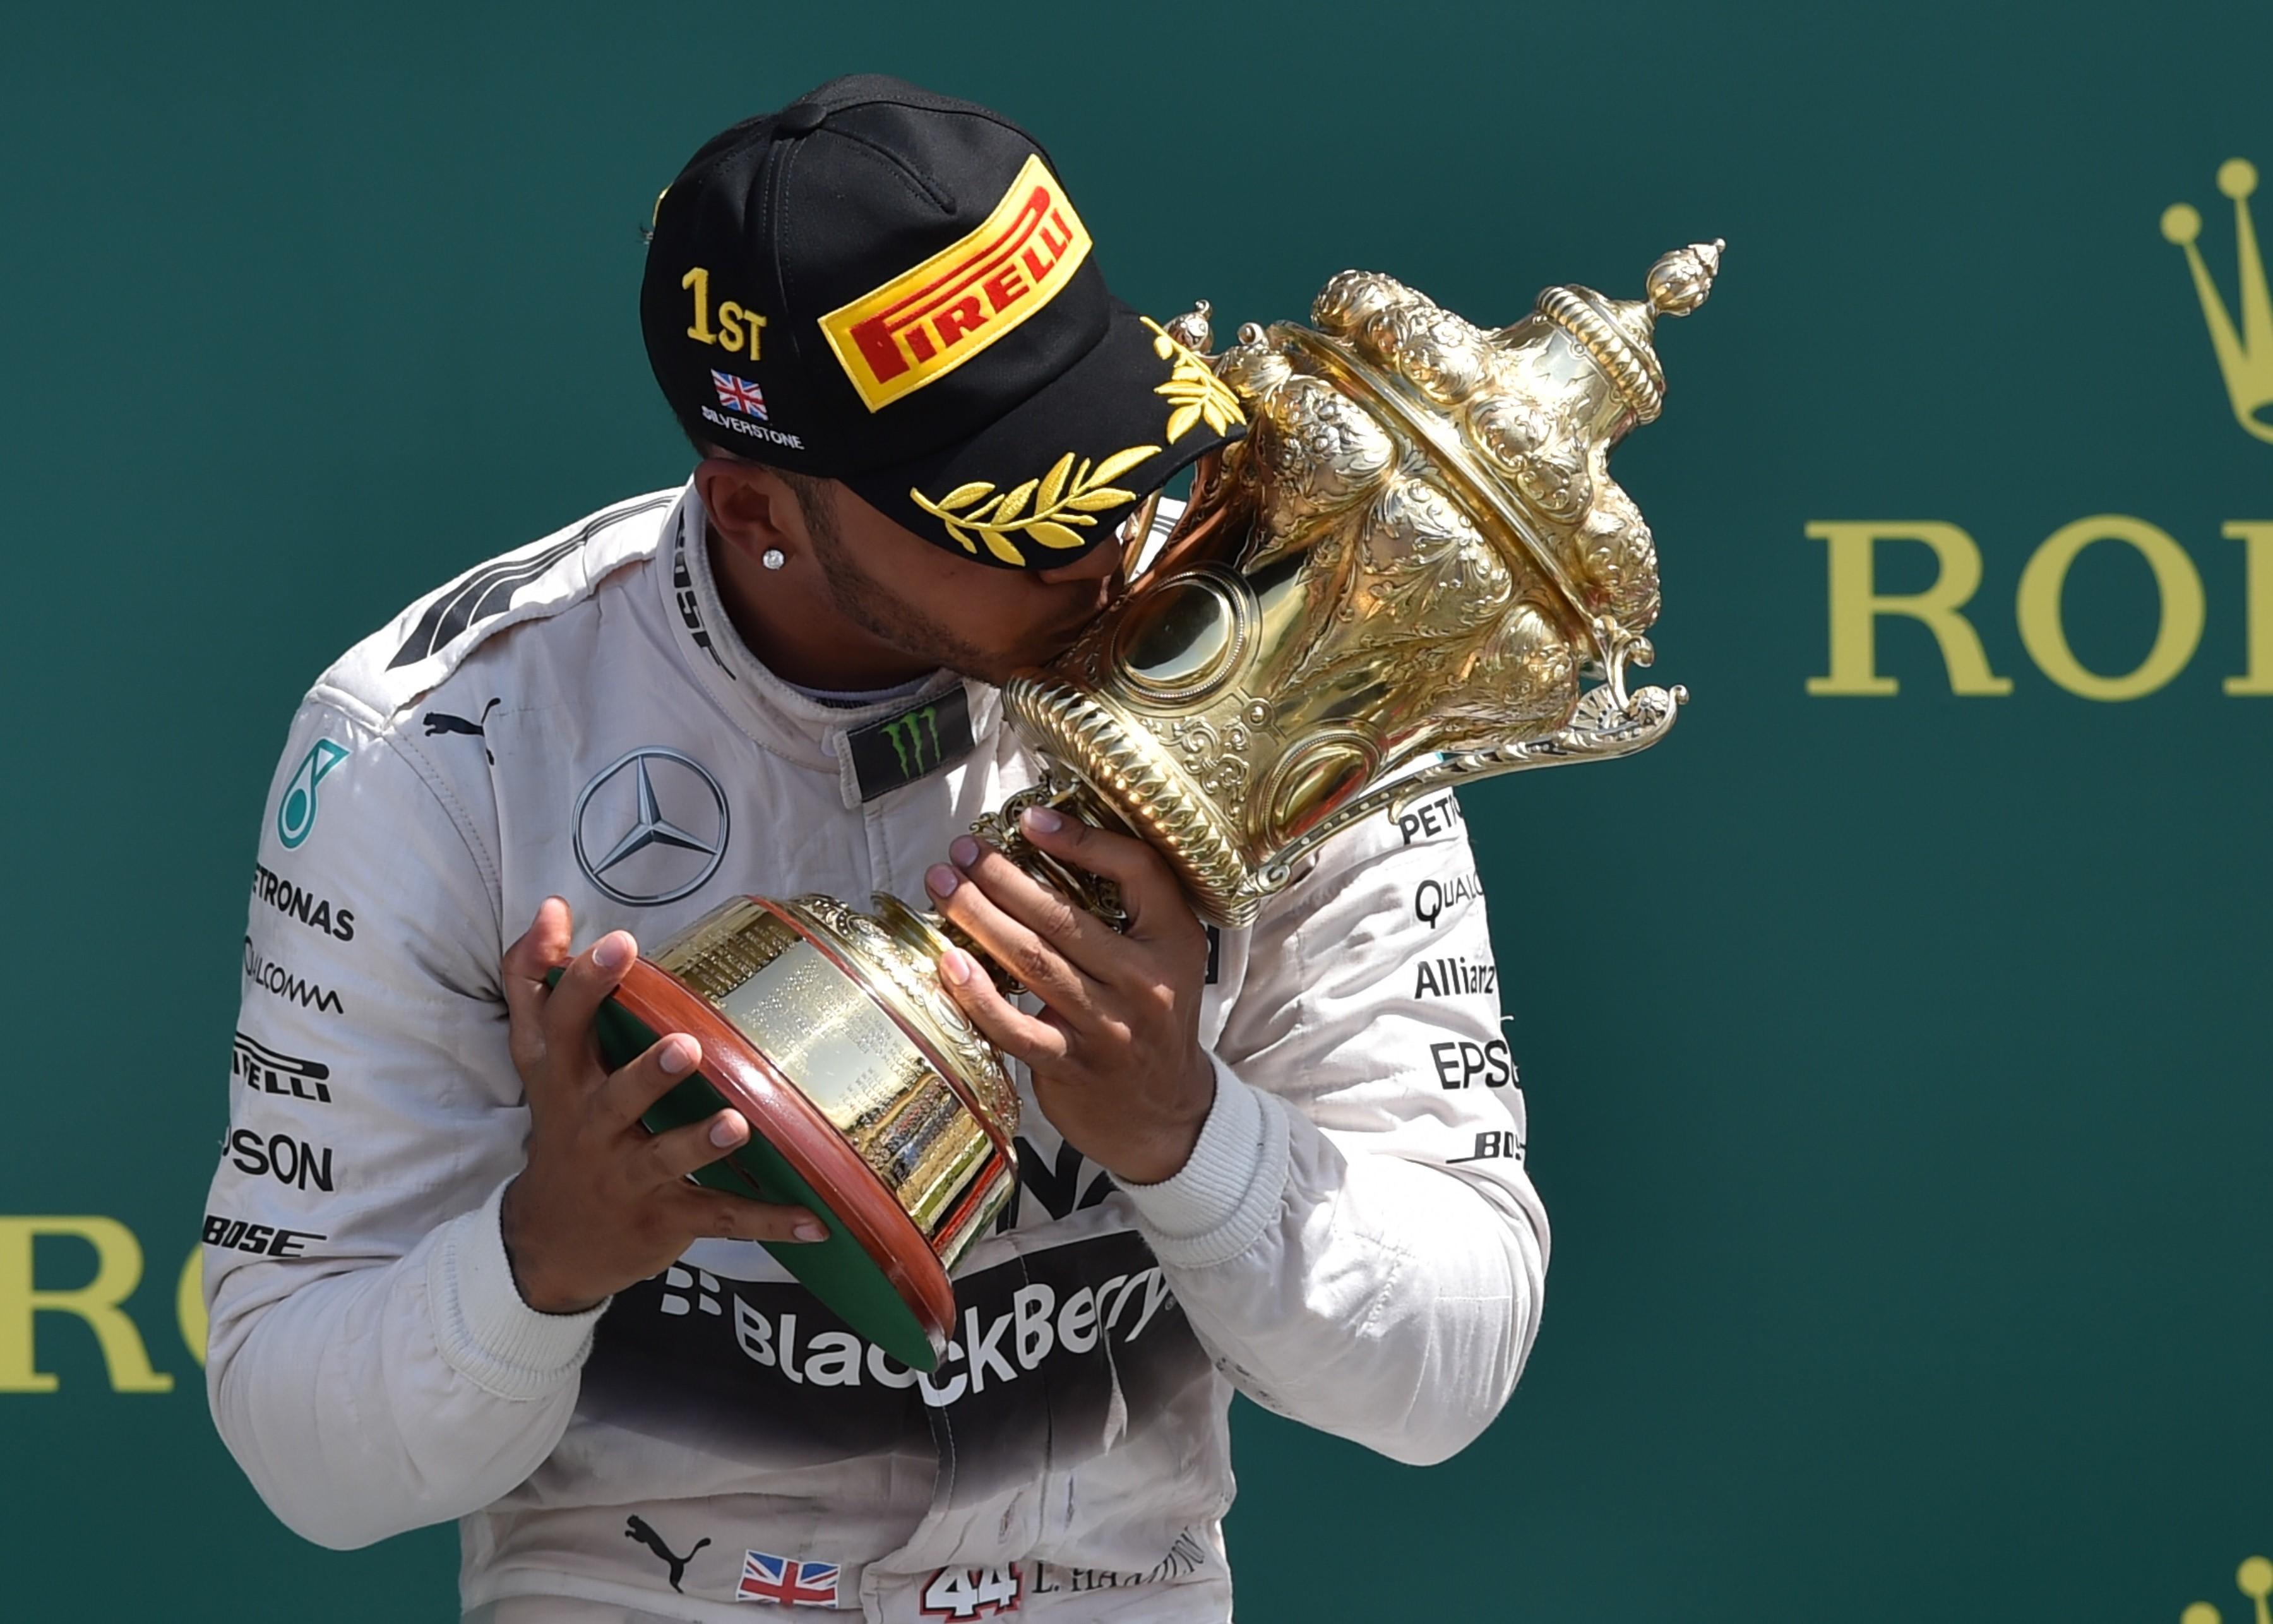 Lewis Hamilton (Mercedes) au Grand Prix de Grande-Bretagne 2015